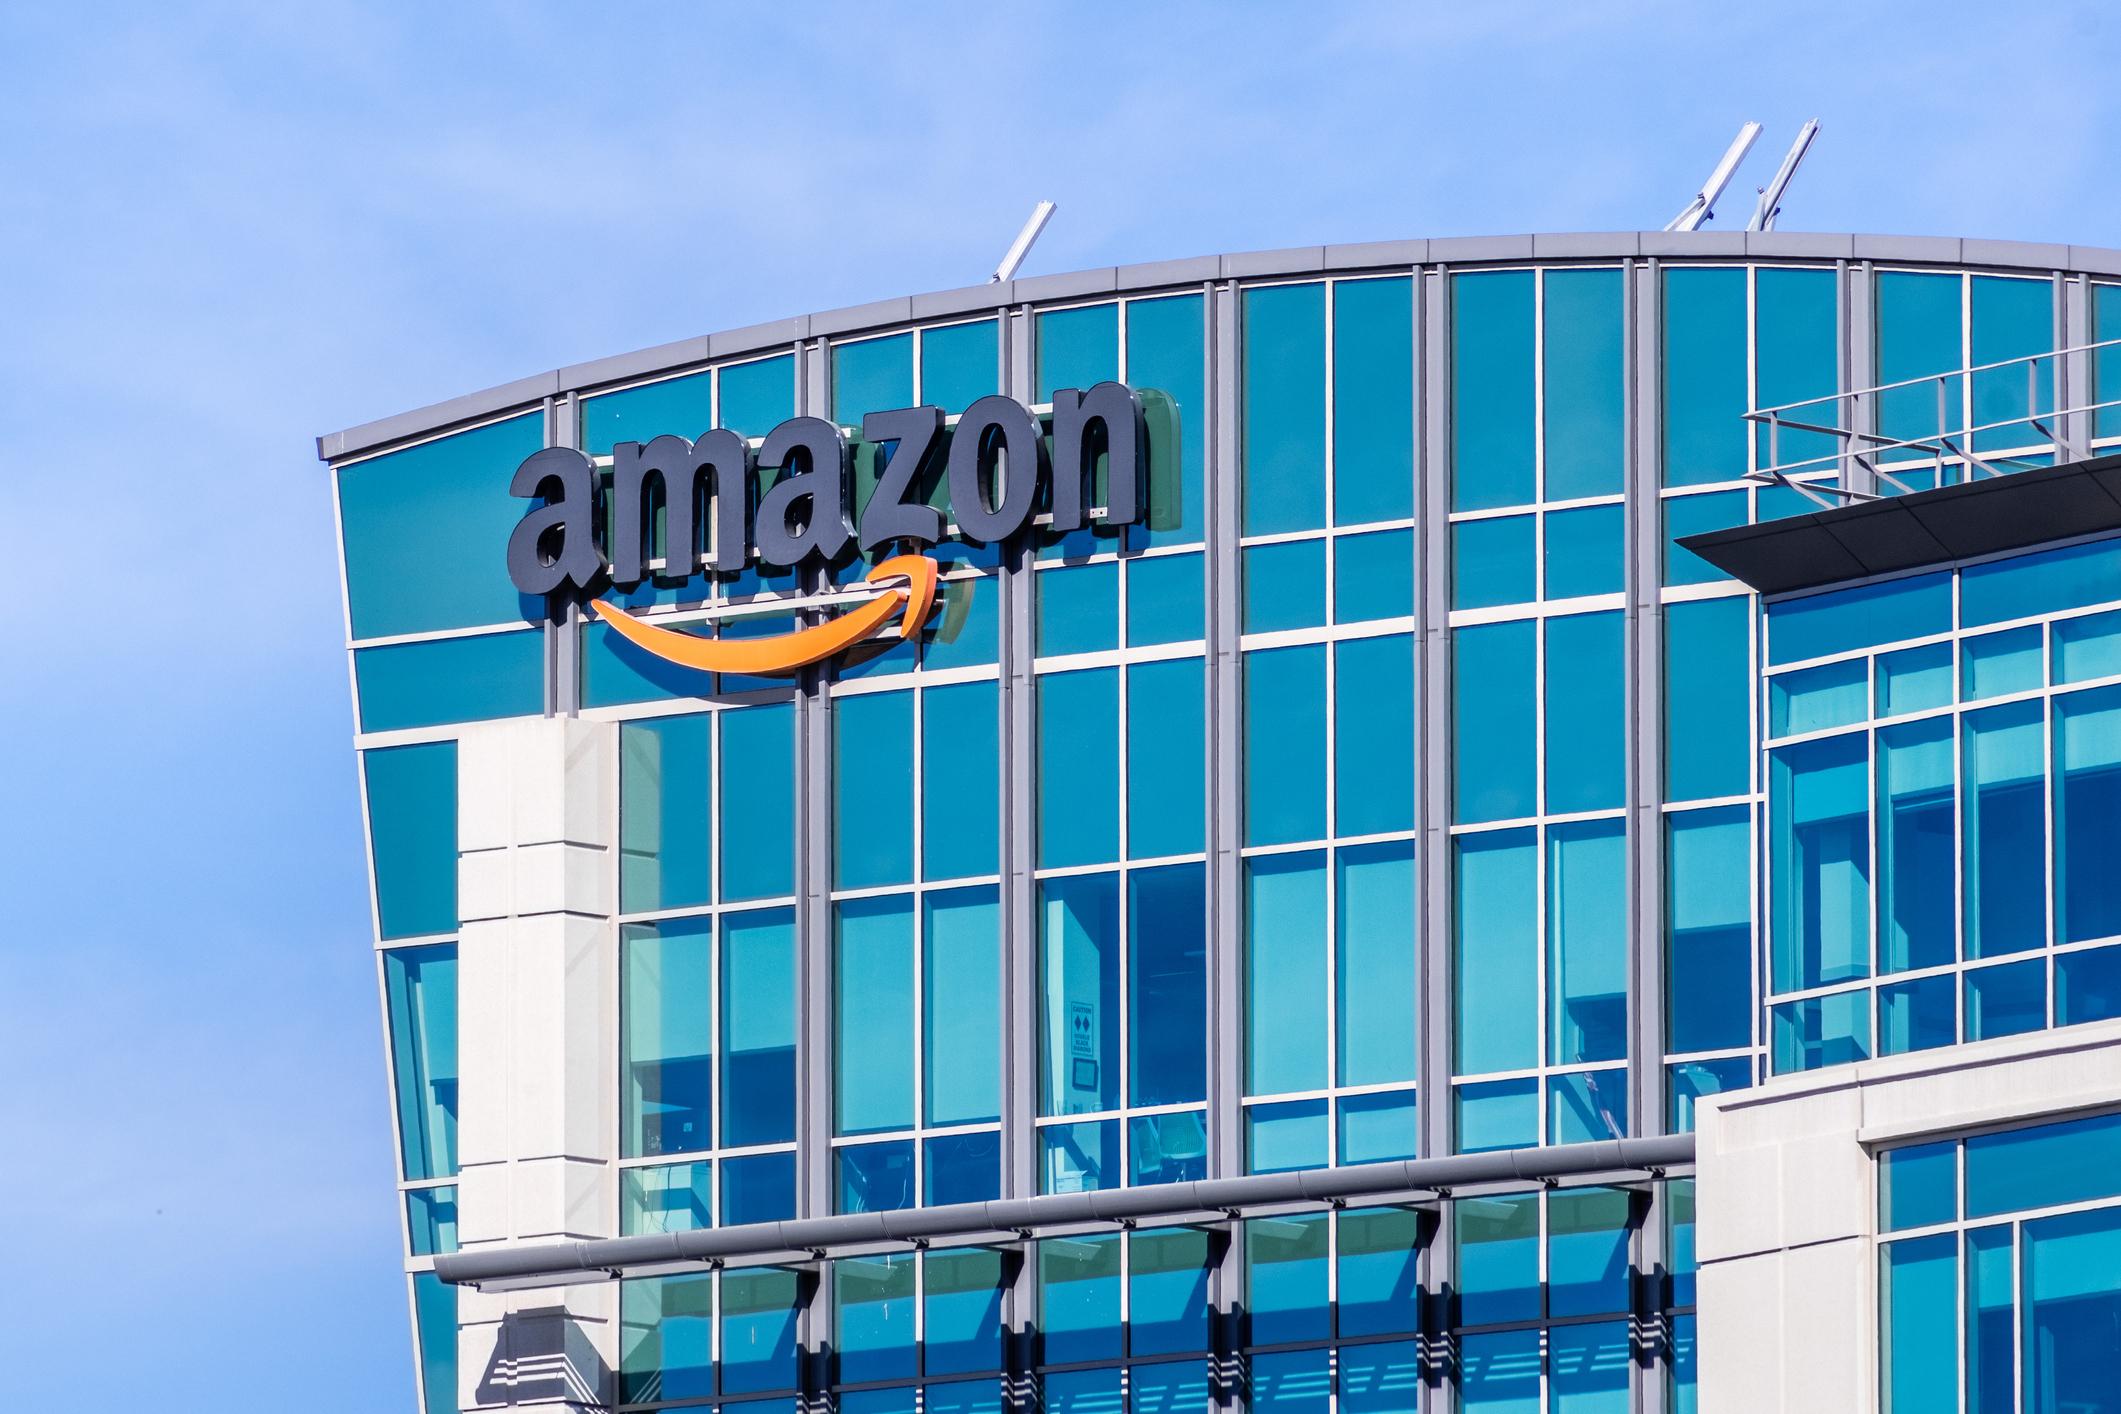 Ảnh tham khảo cổ phiếu Amazon